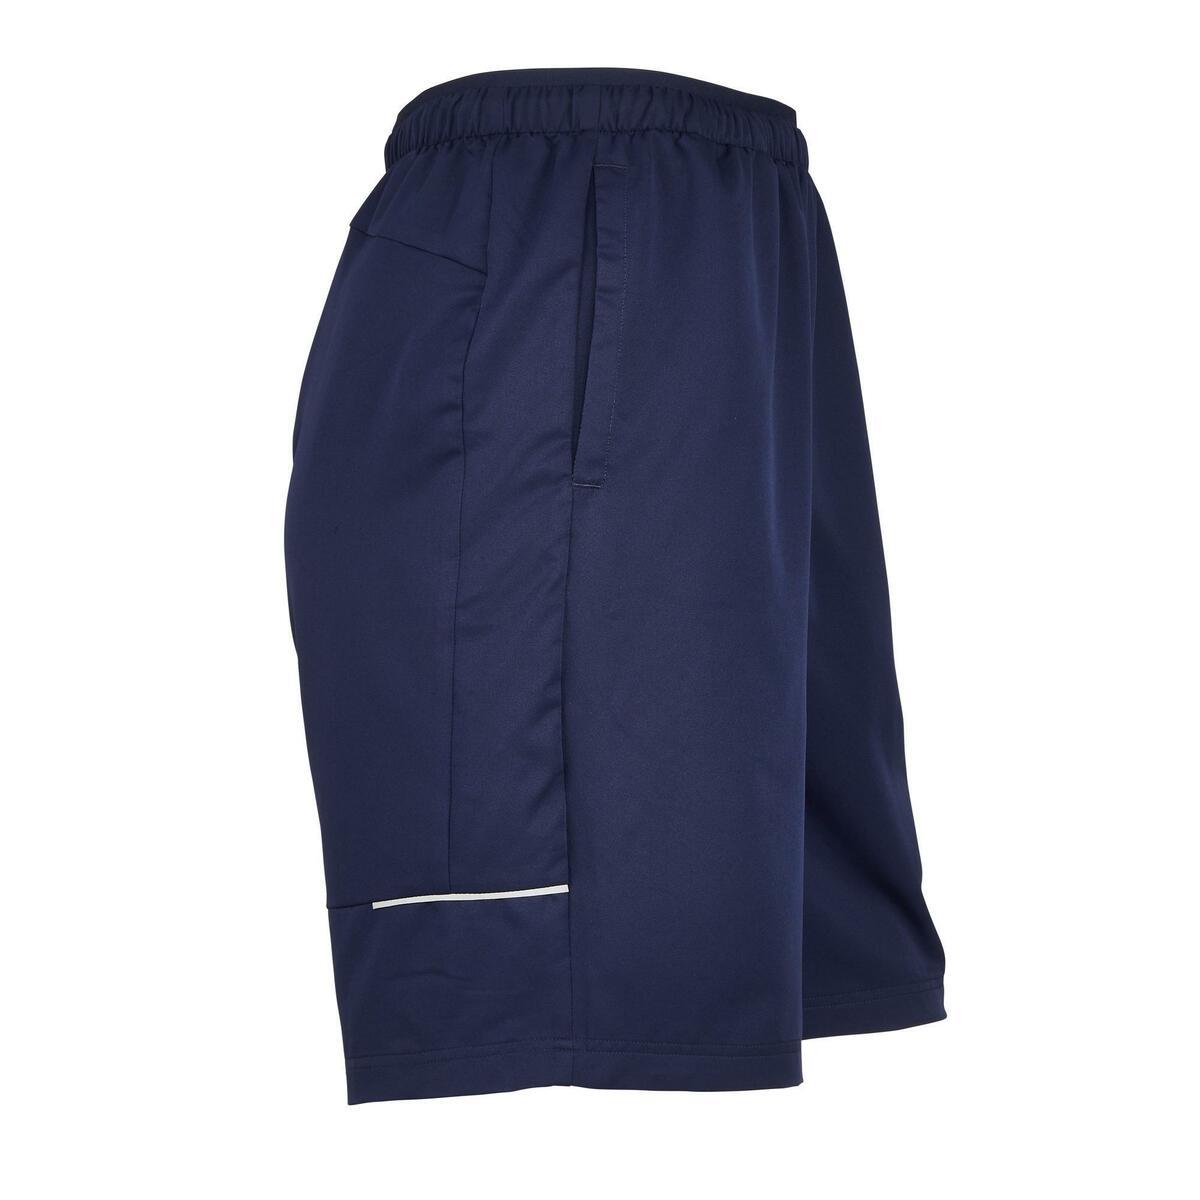 Bild 3 von Sporthose kurz Fitness Herren blau